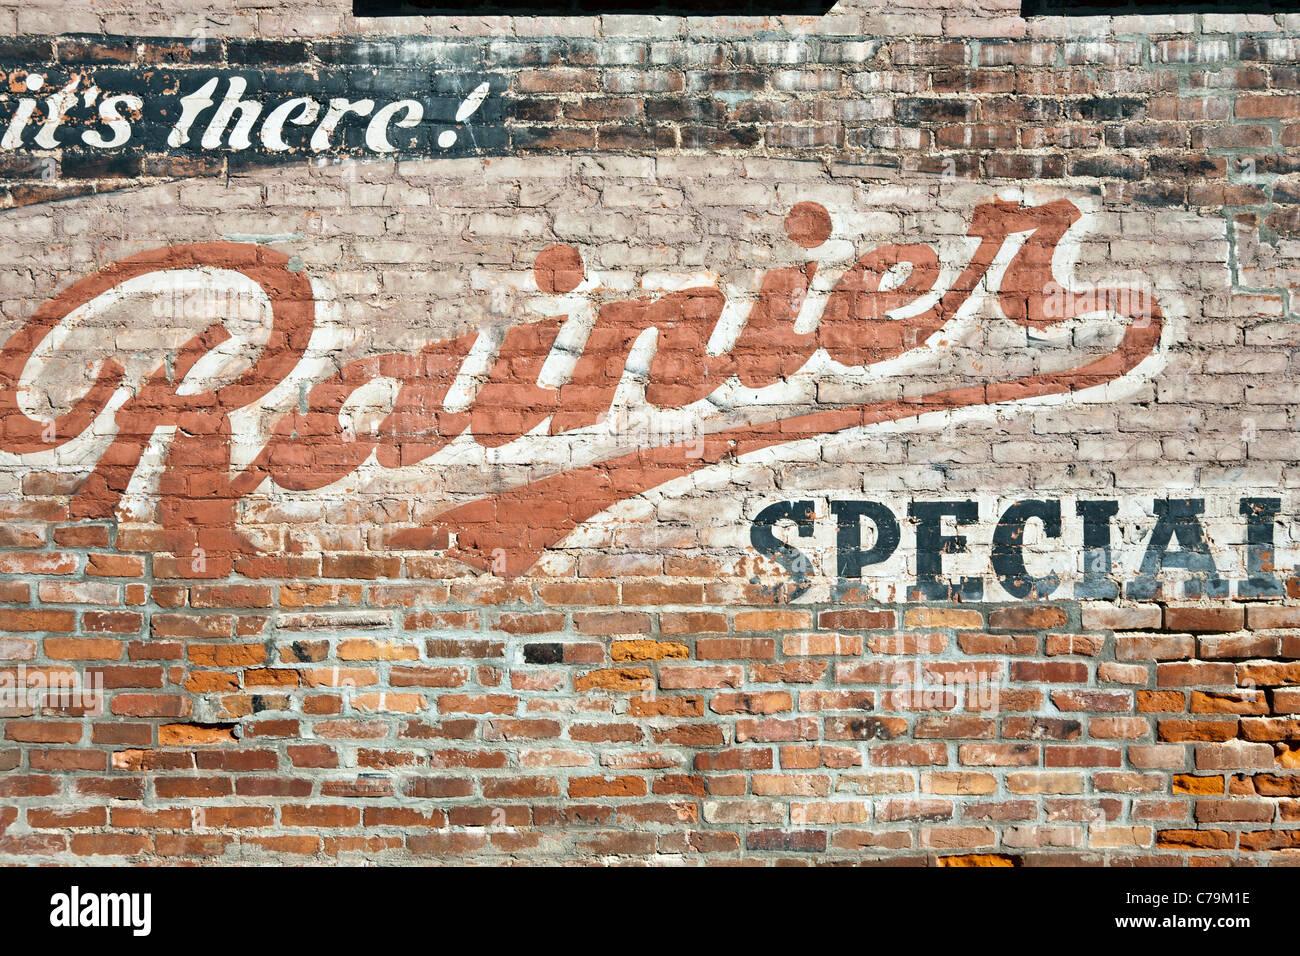 Coca-Cola advertisement on brick wall | Bricks, Walls and Coca Cola